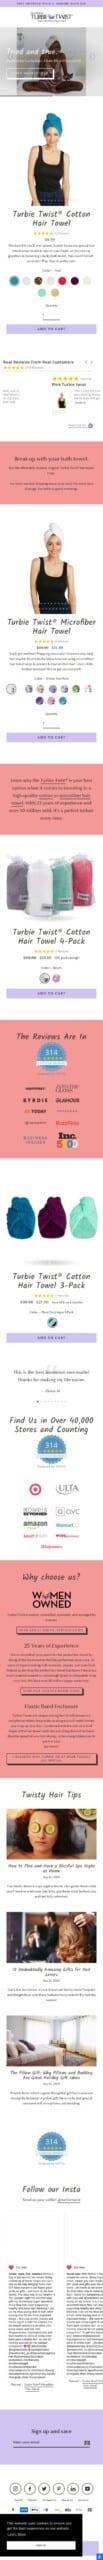 Turbie Twist Coupon